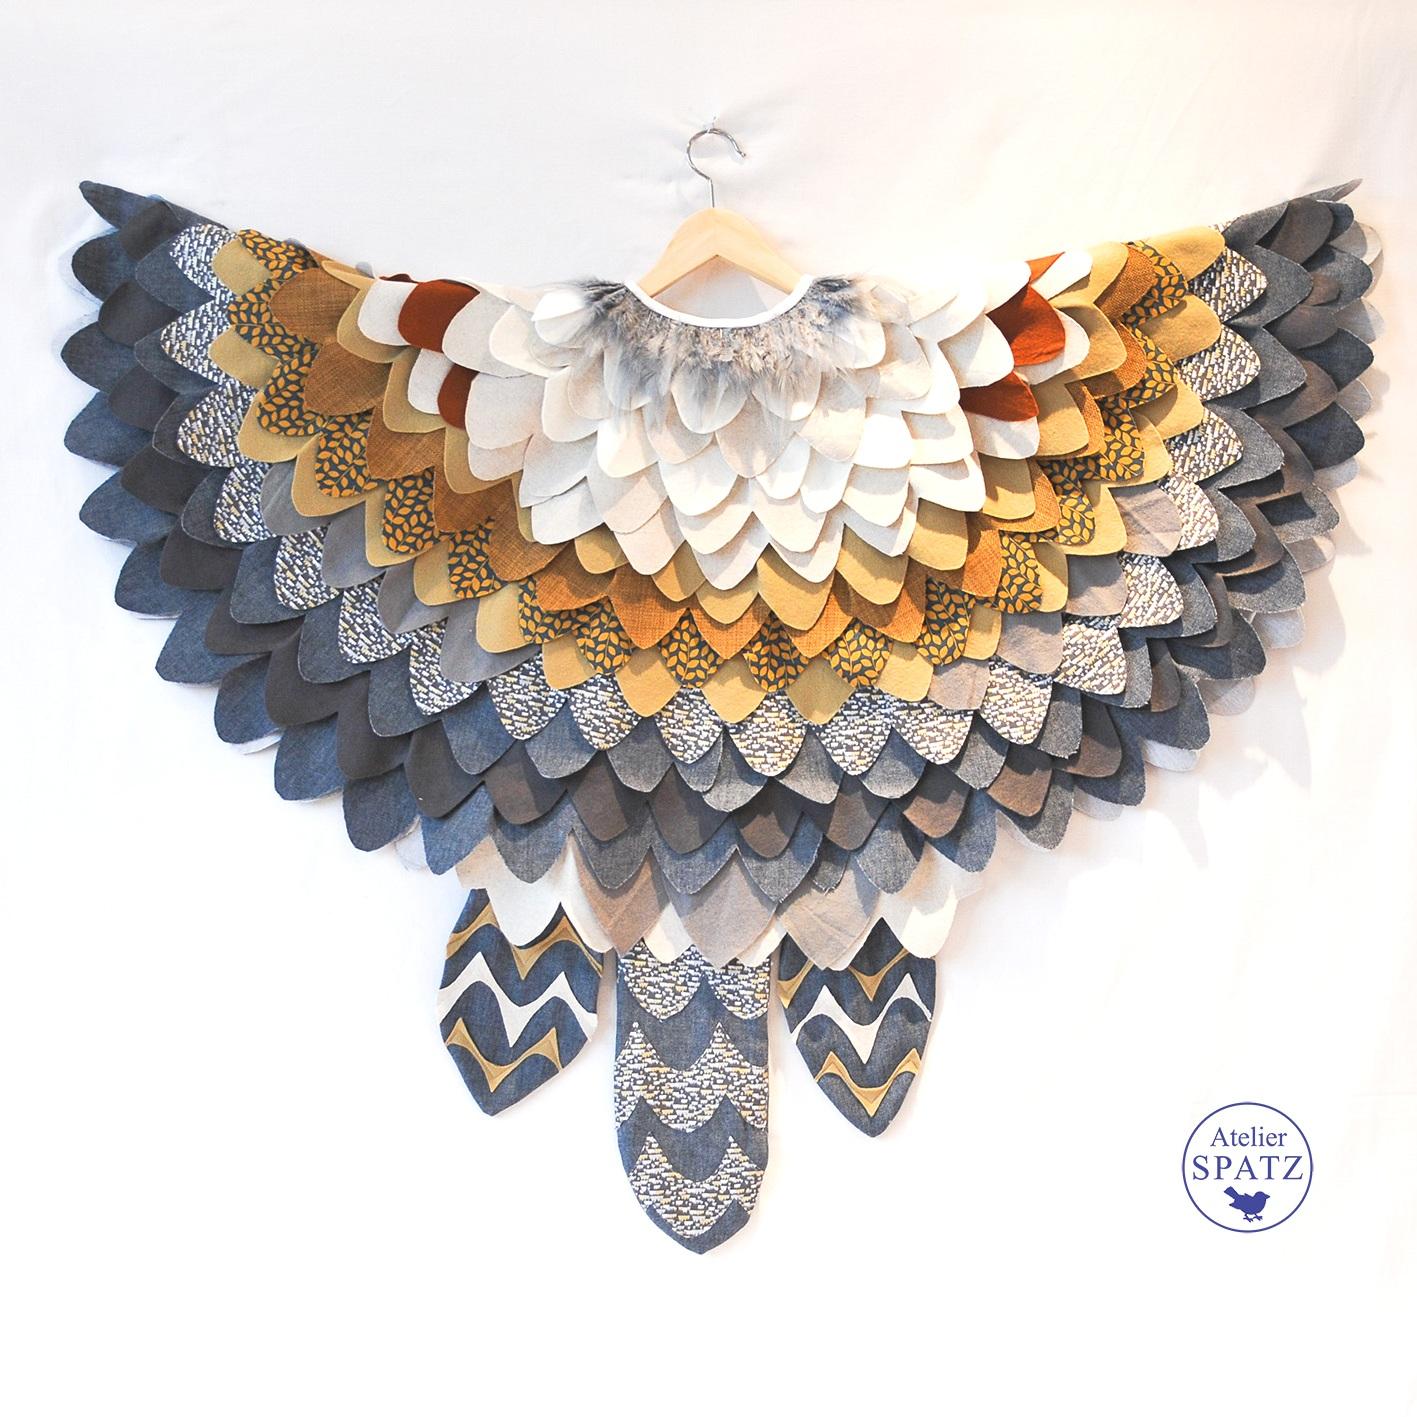 Atelier Spatz Winter Owl.jpg